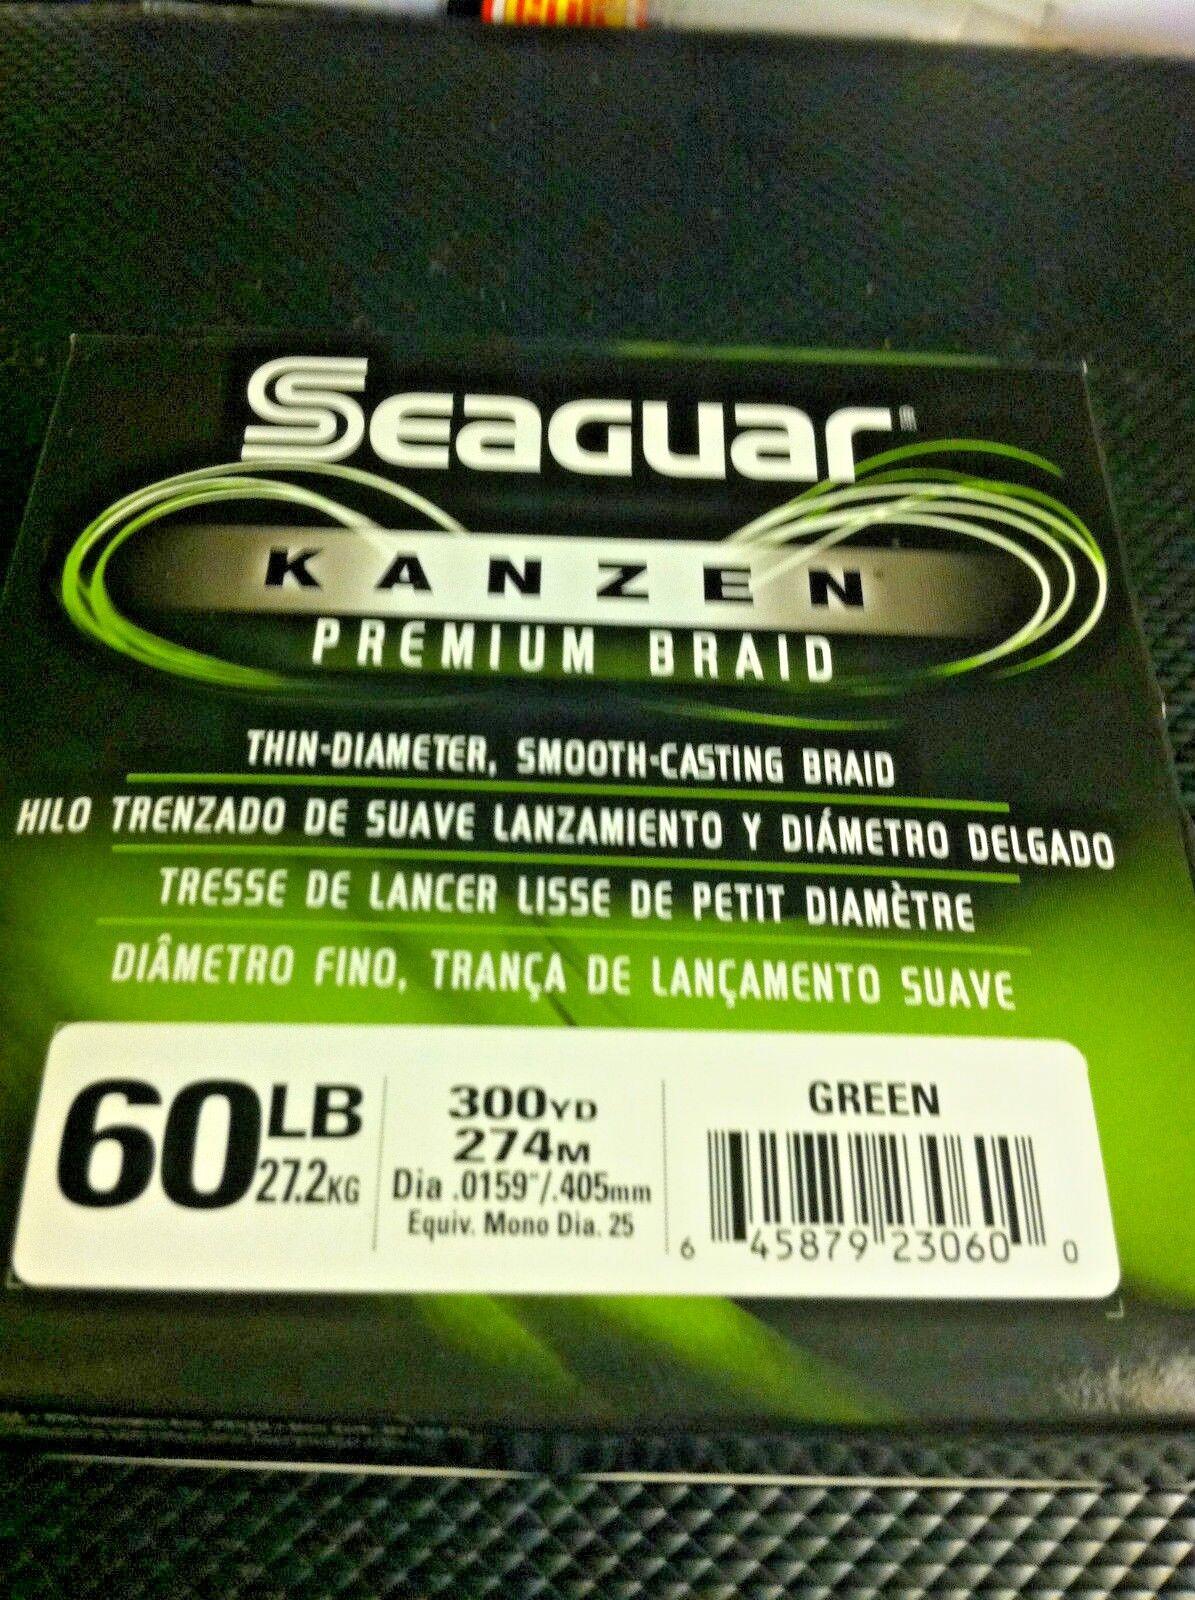 SEAGUAR KANZEN -- 60 lbs - 300 YDS ADVANCE MICROFIBERS SMOOTH CASTING SENSITIVE